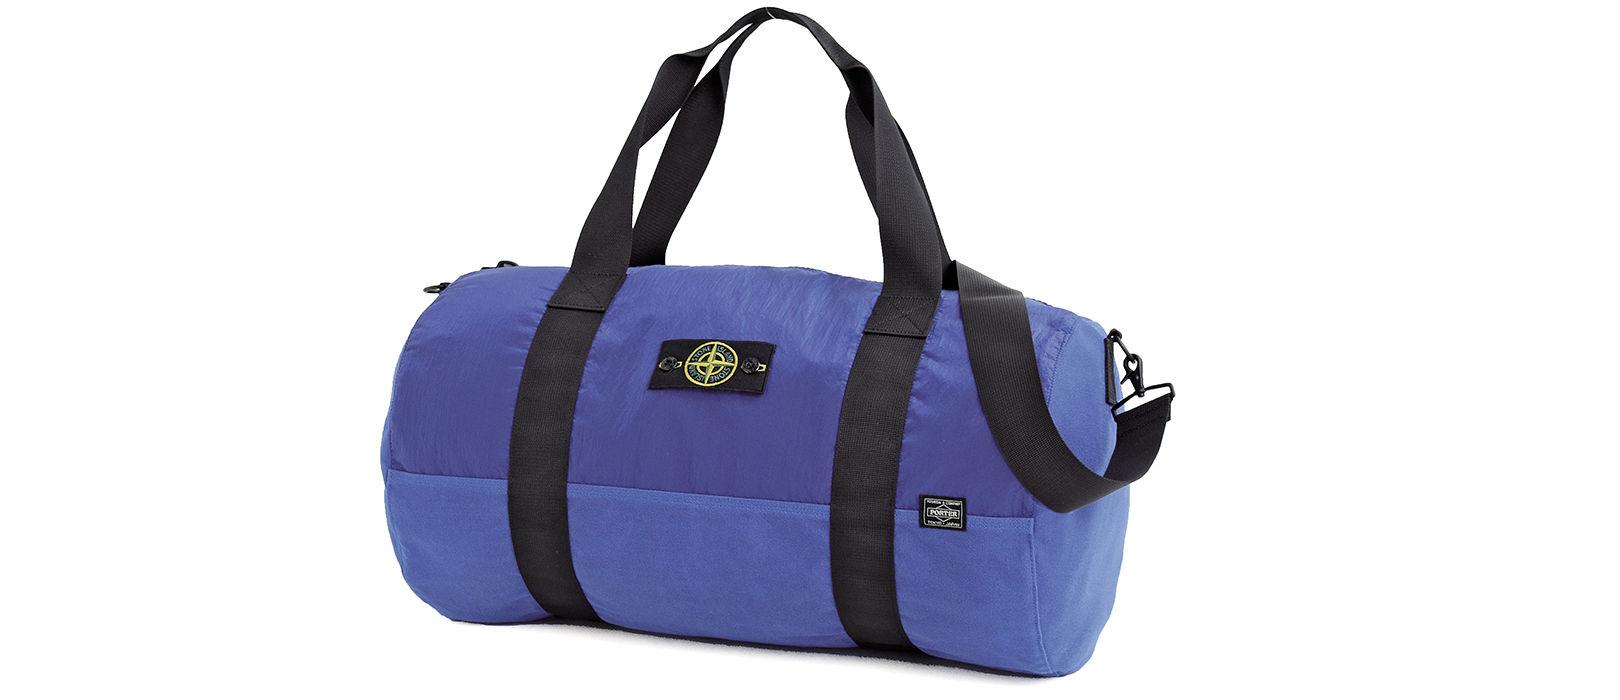 A blue shoulder bag made of Polypropylene Tela and Nylon Metal.